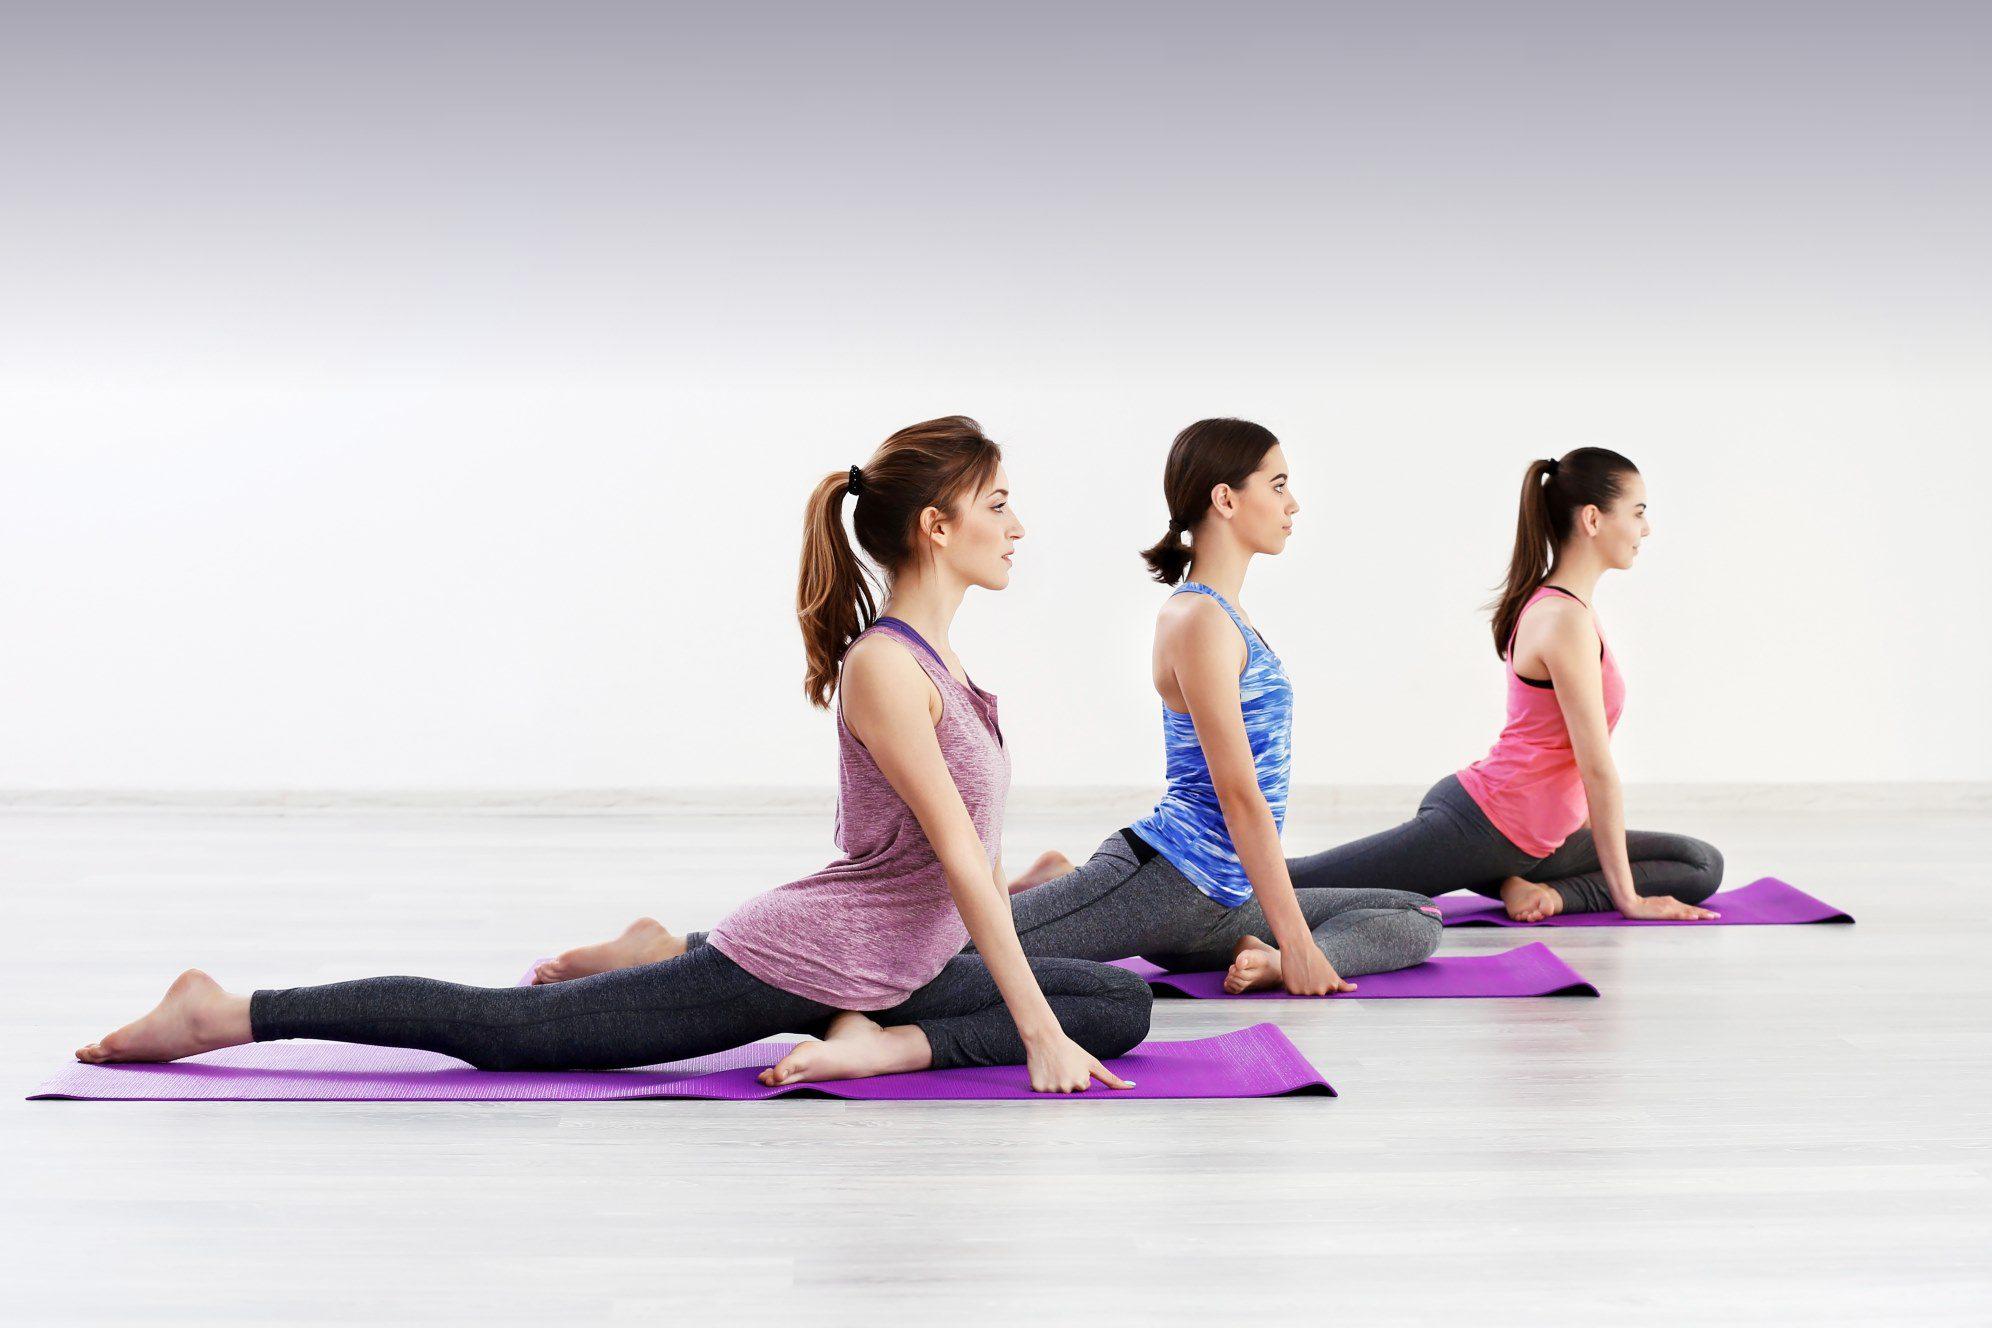 Slide 2 – cours yoga magny en vexin